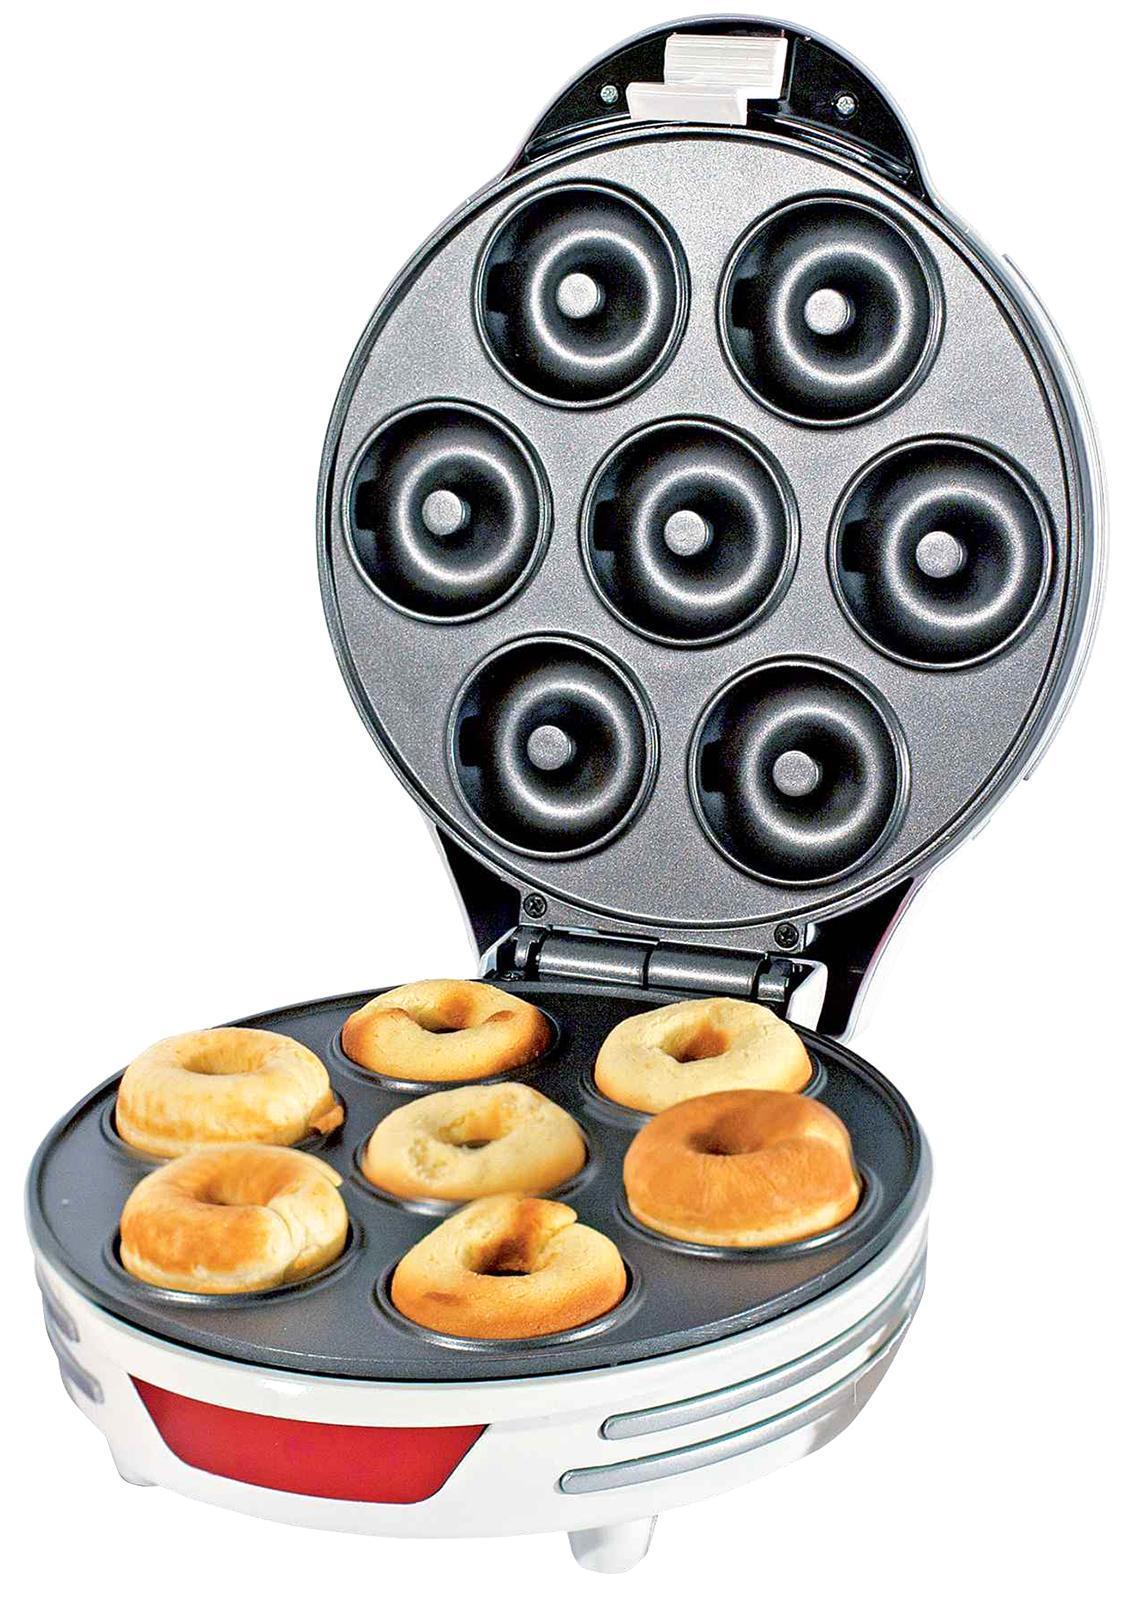 Ariete 189 Party Time прибор для приготовления пончиков home car cd player 4 channel audio amplifier with remote control and bluetooth function good sound quality